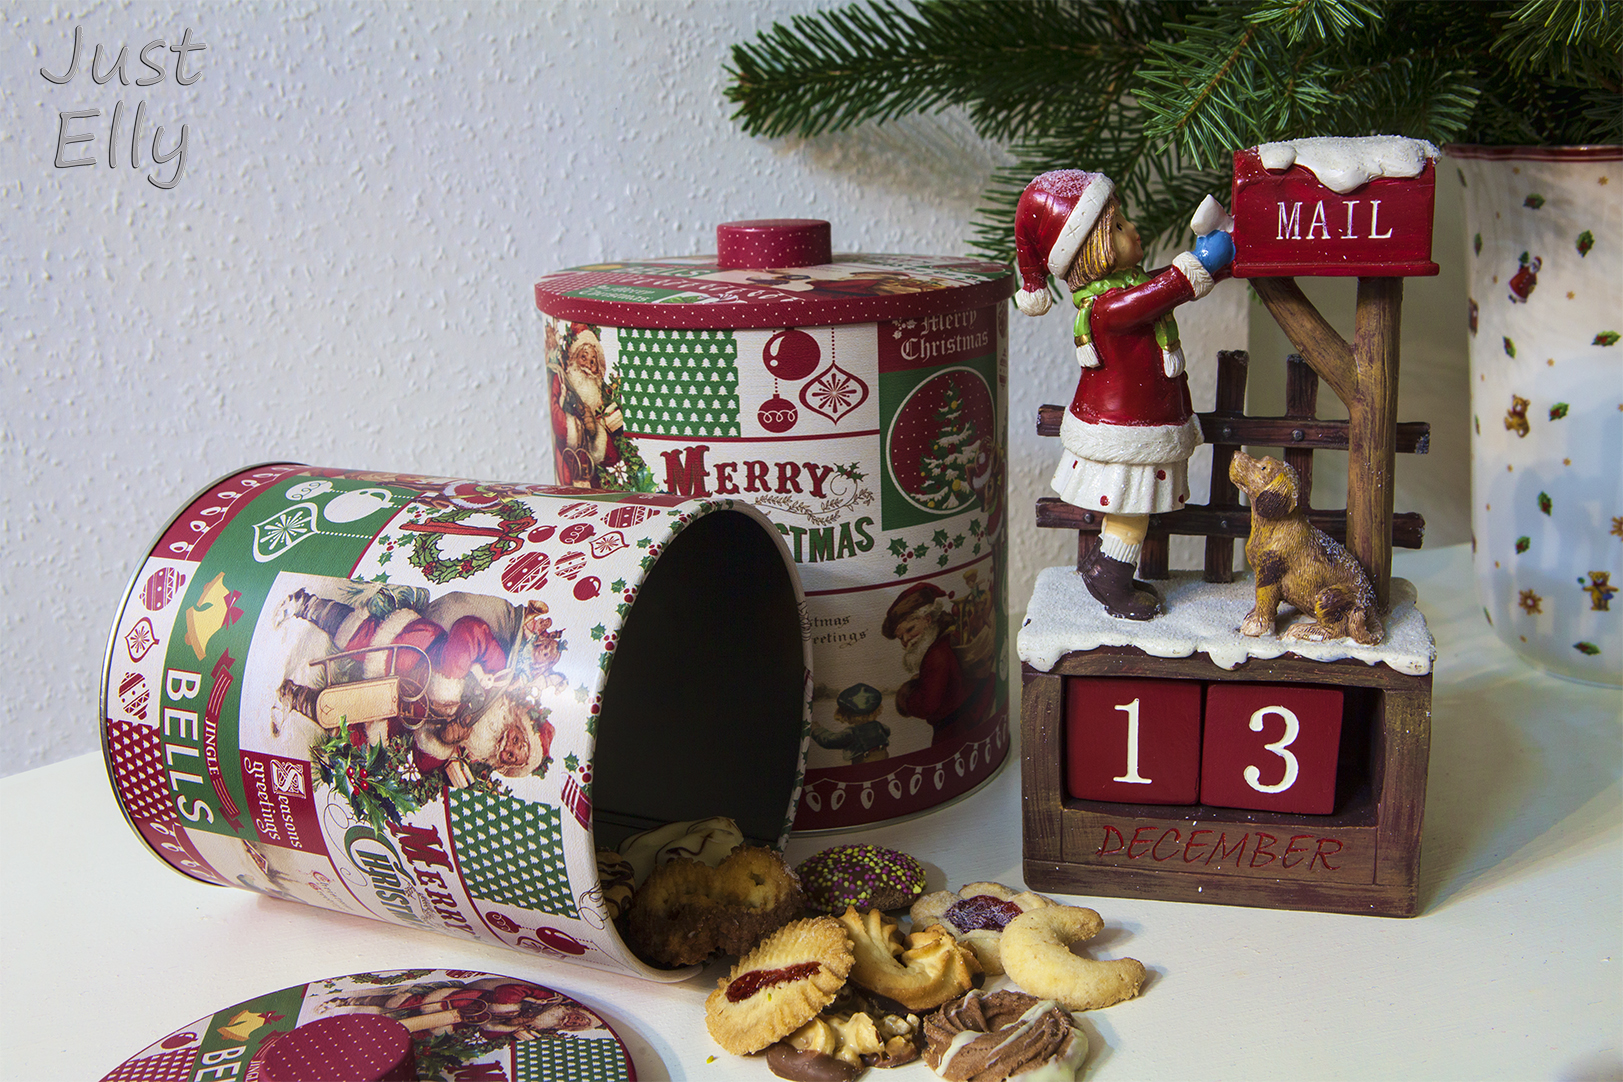 December 13th - My advent calendar